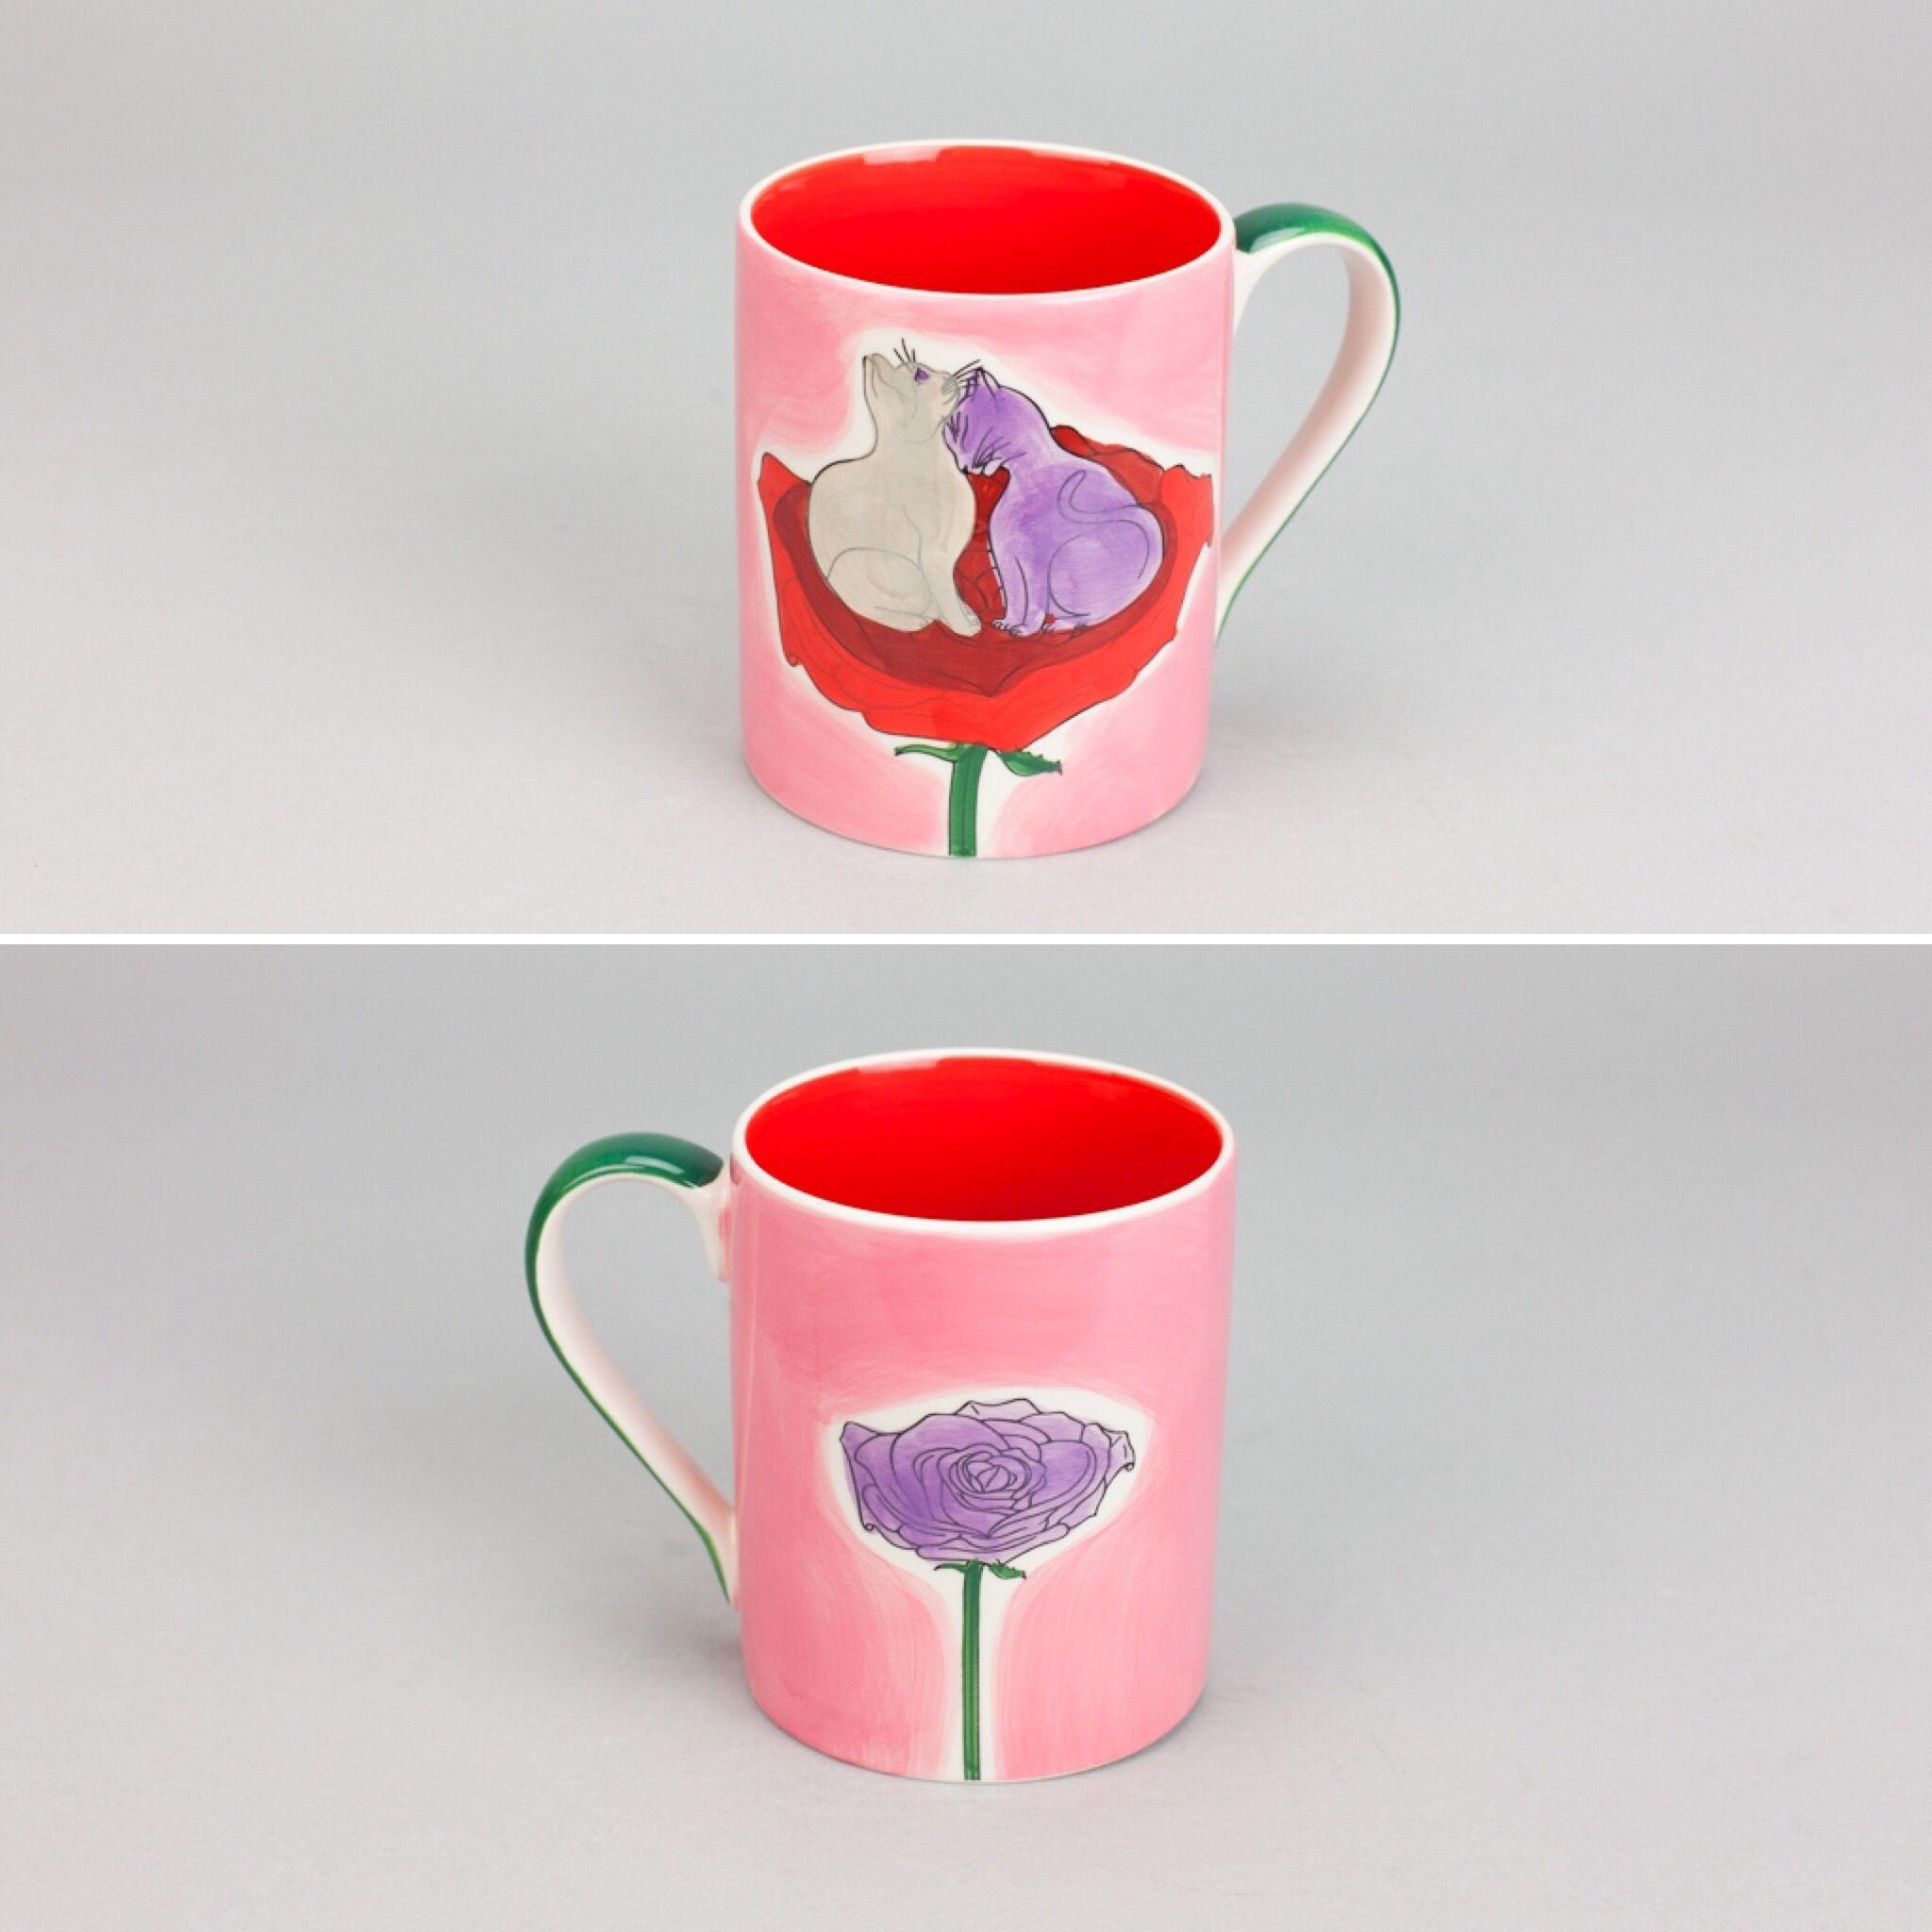 Caneca Rose Eternal Love | A Loja do Gato Preto | #alojadogatopreto | #shoponline